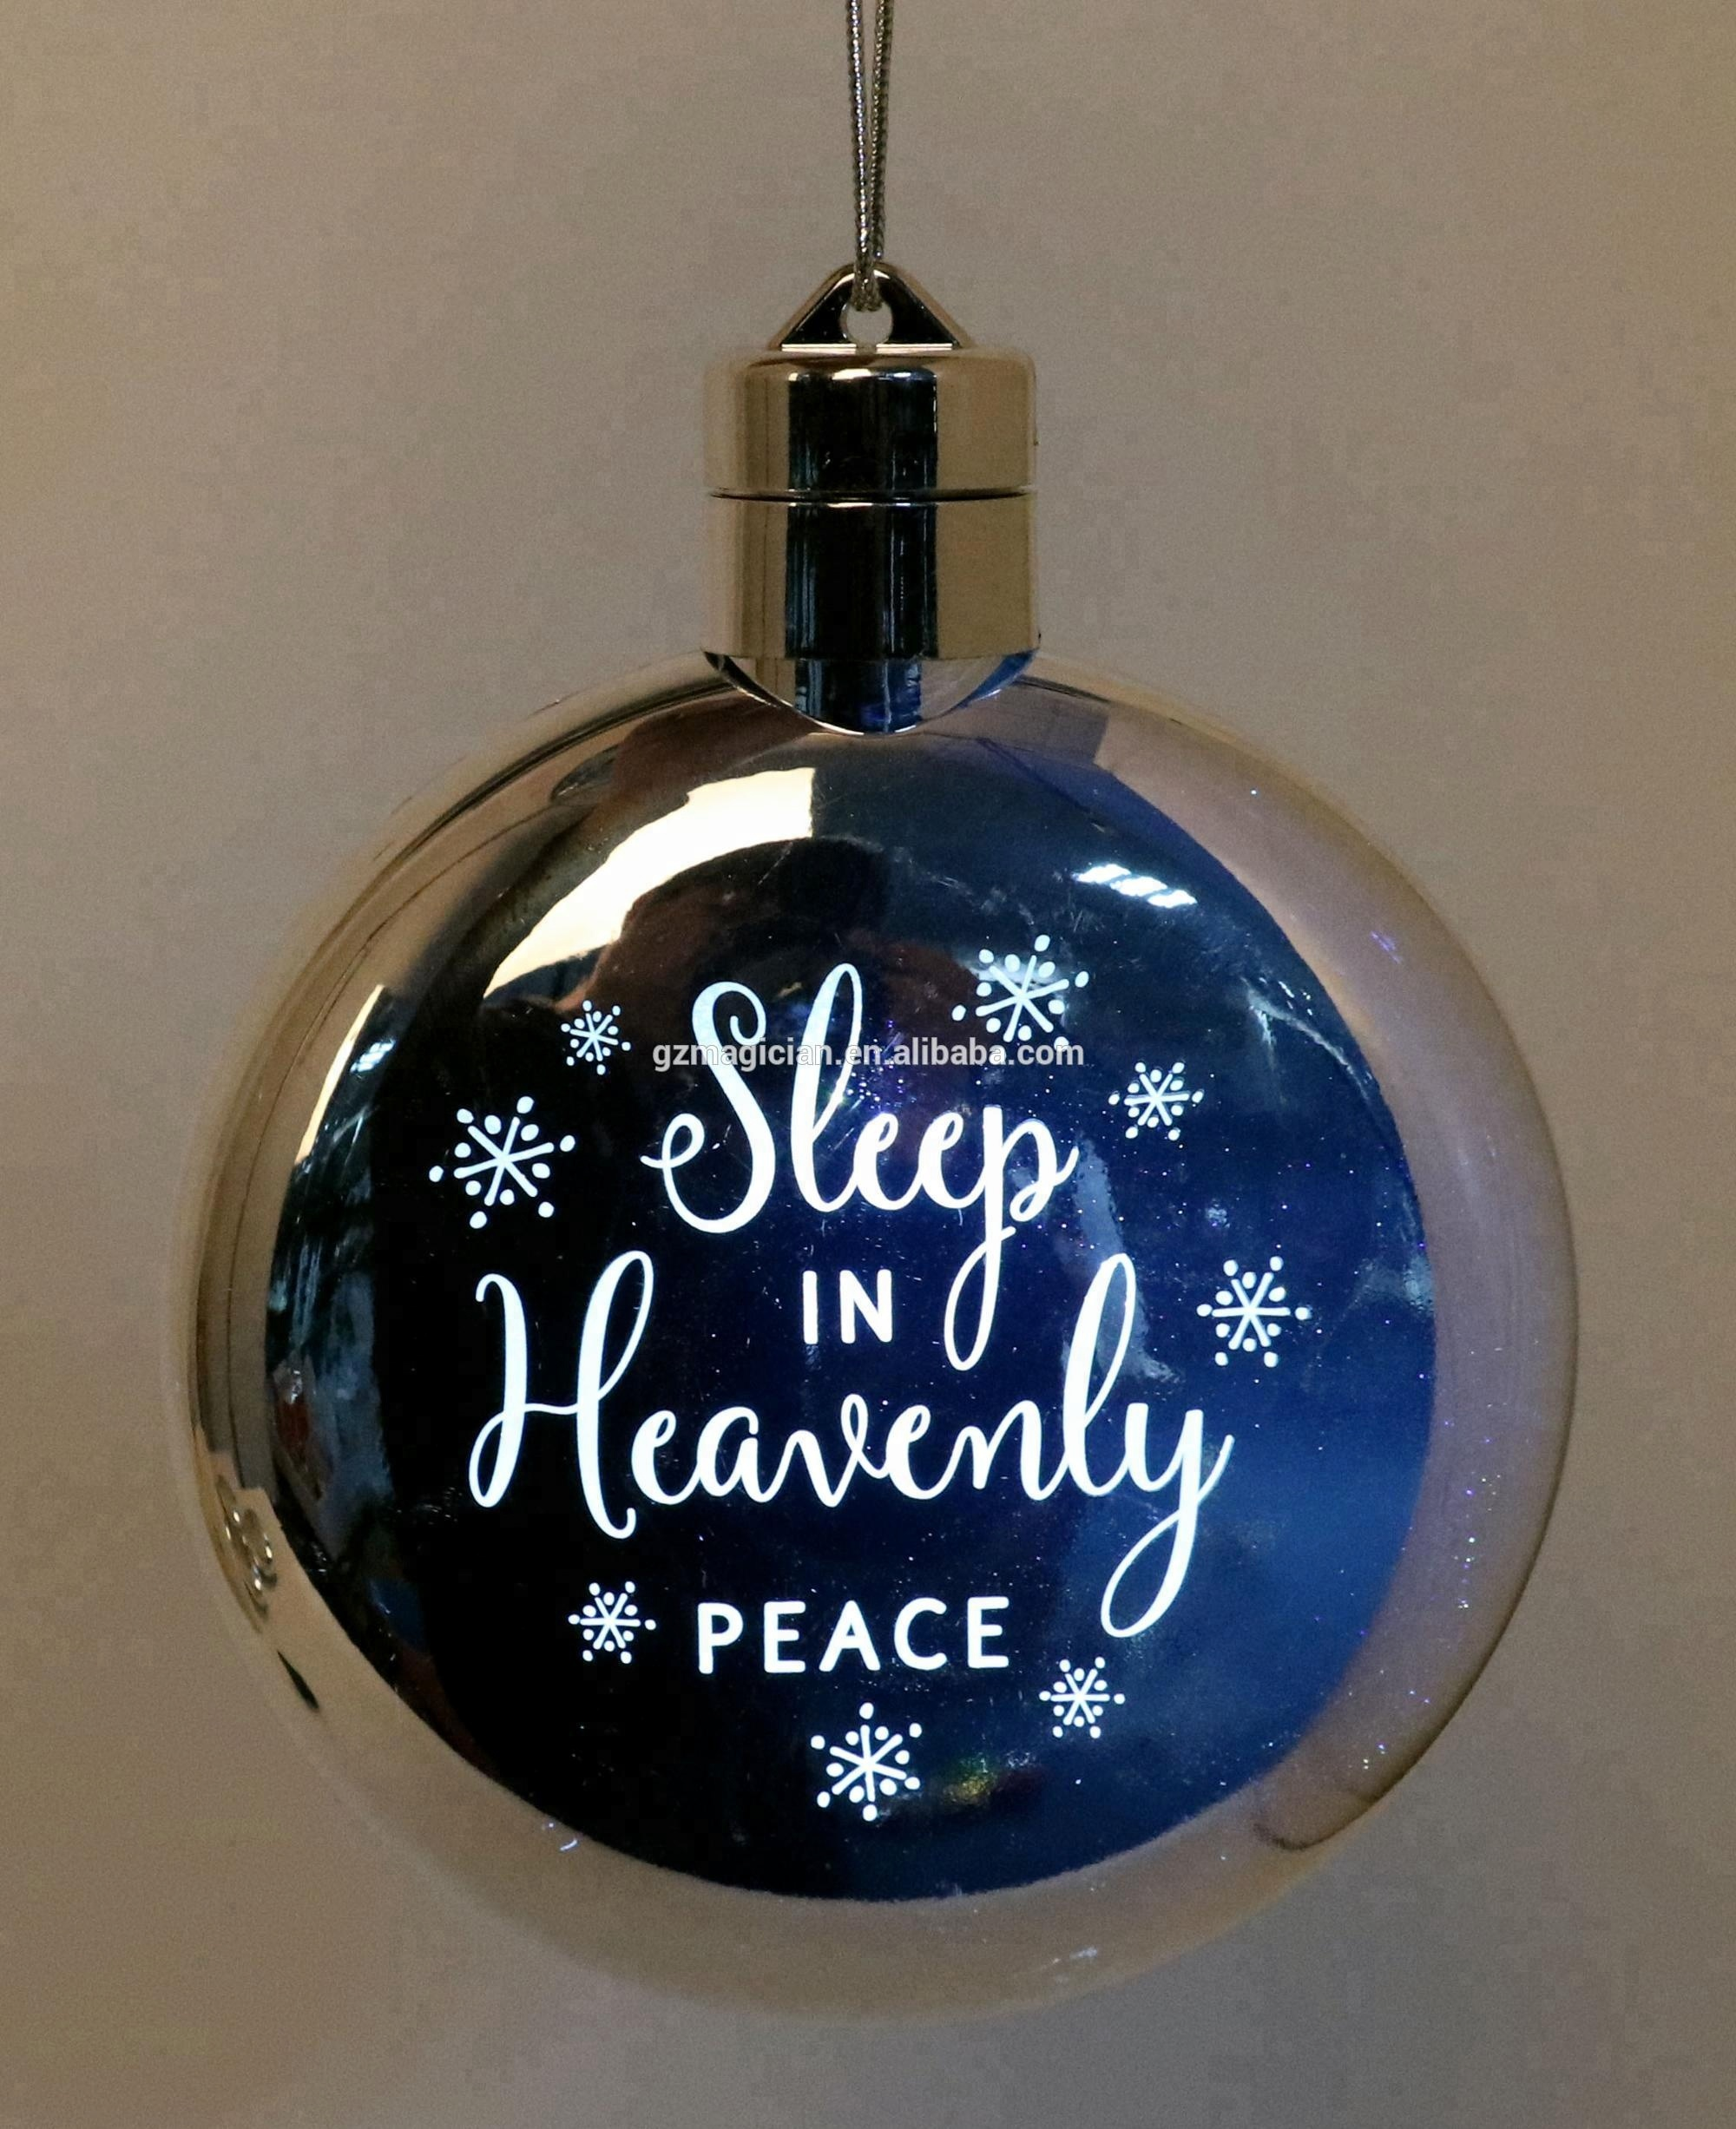 Wholesale Christmas Ball Ornament Suppliers Mercury Glass